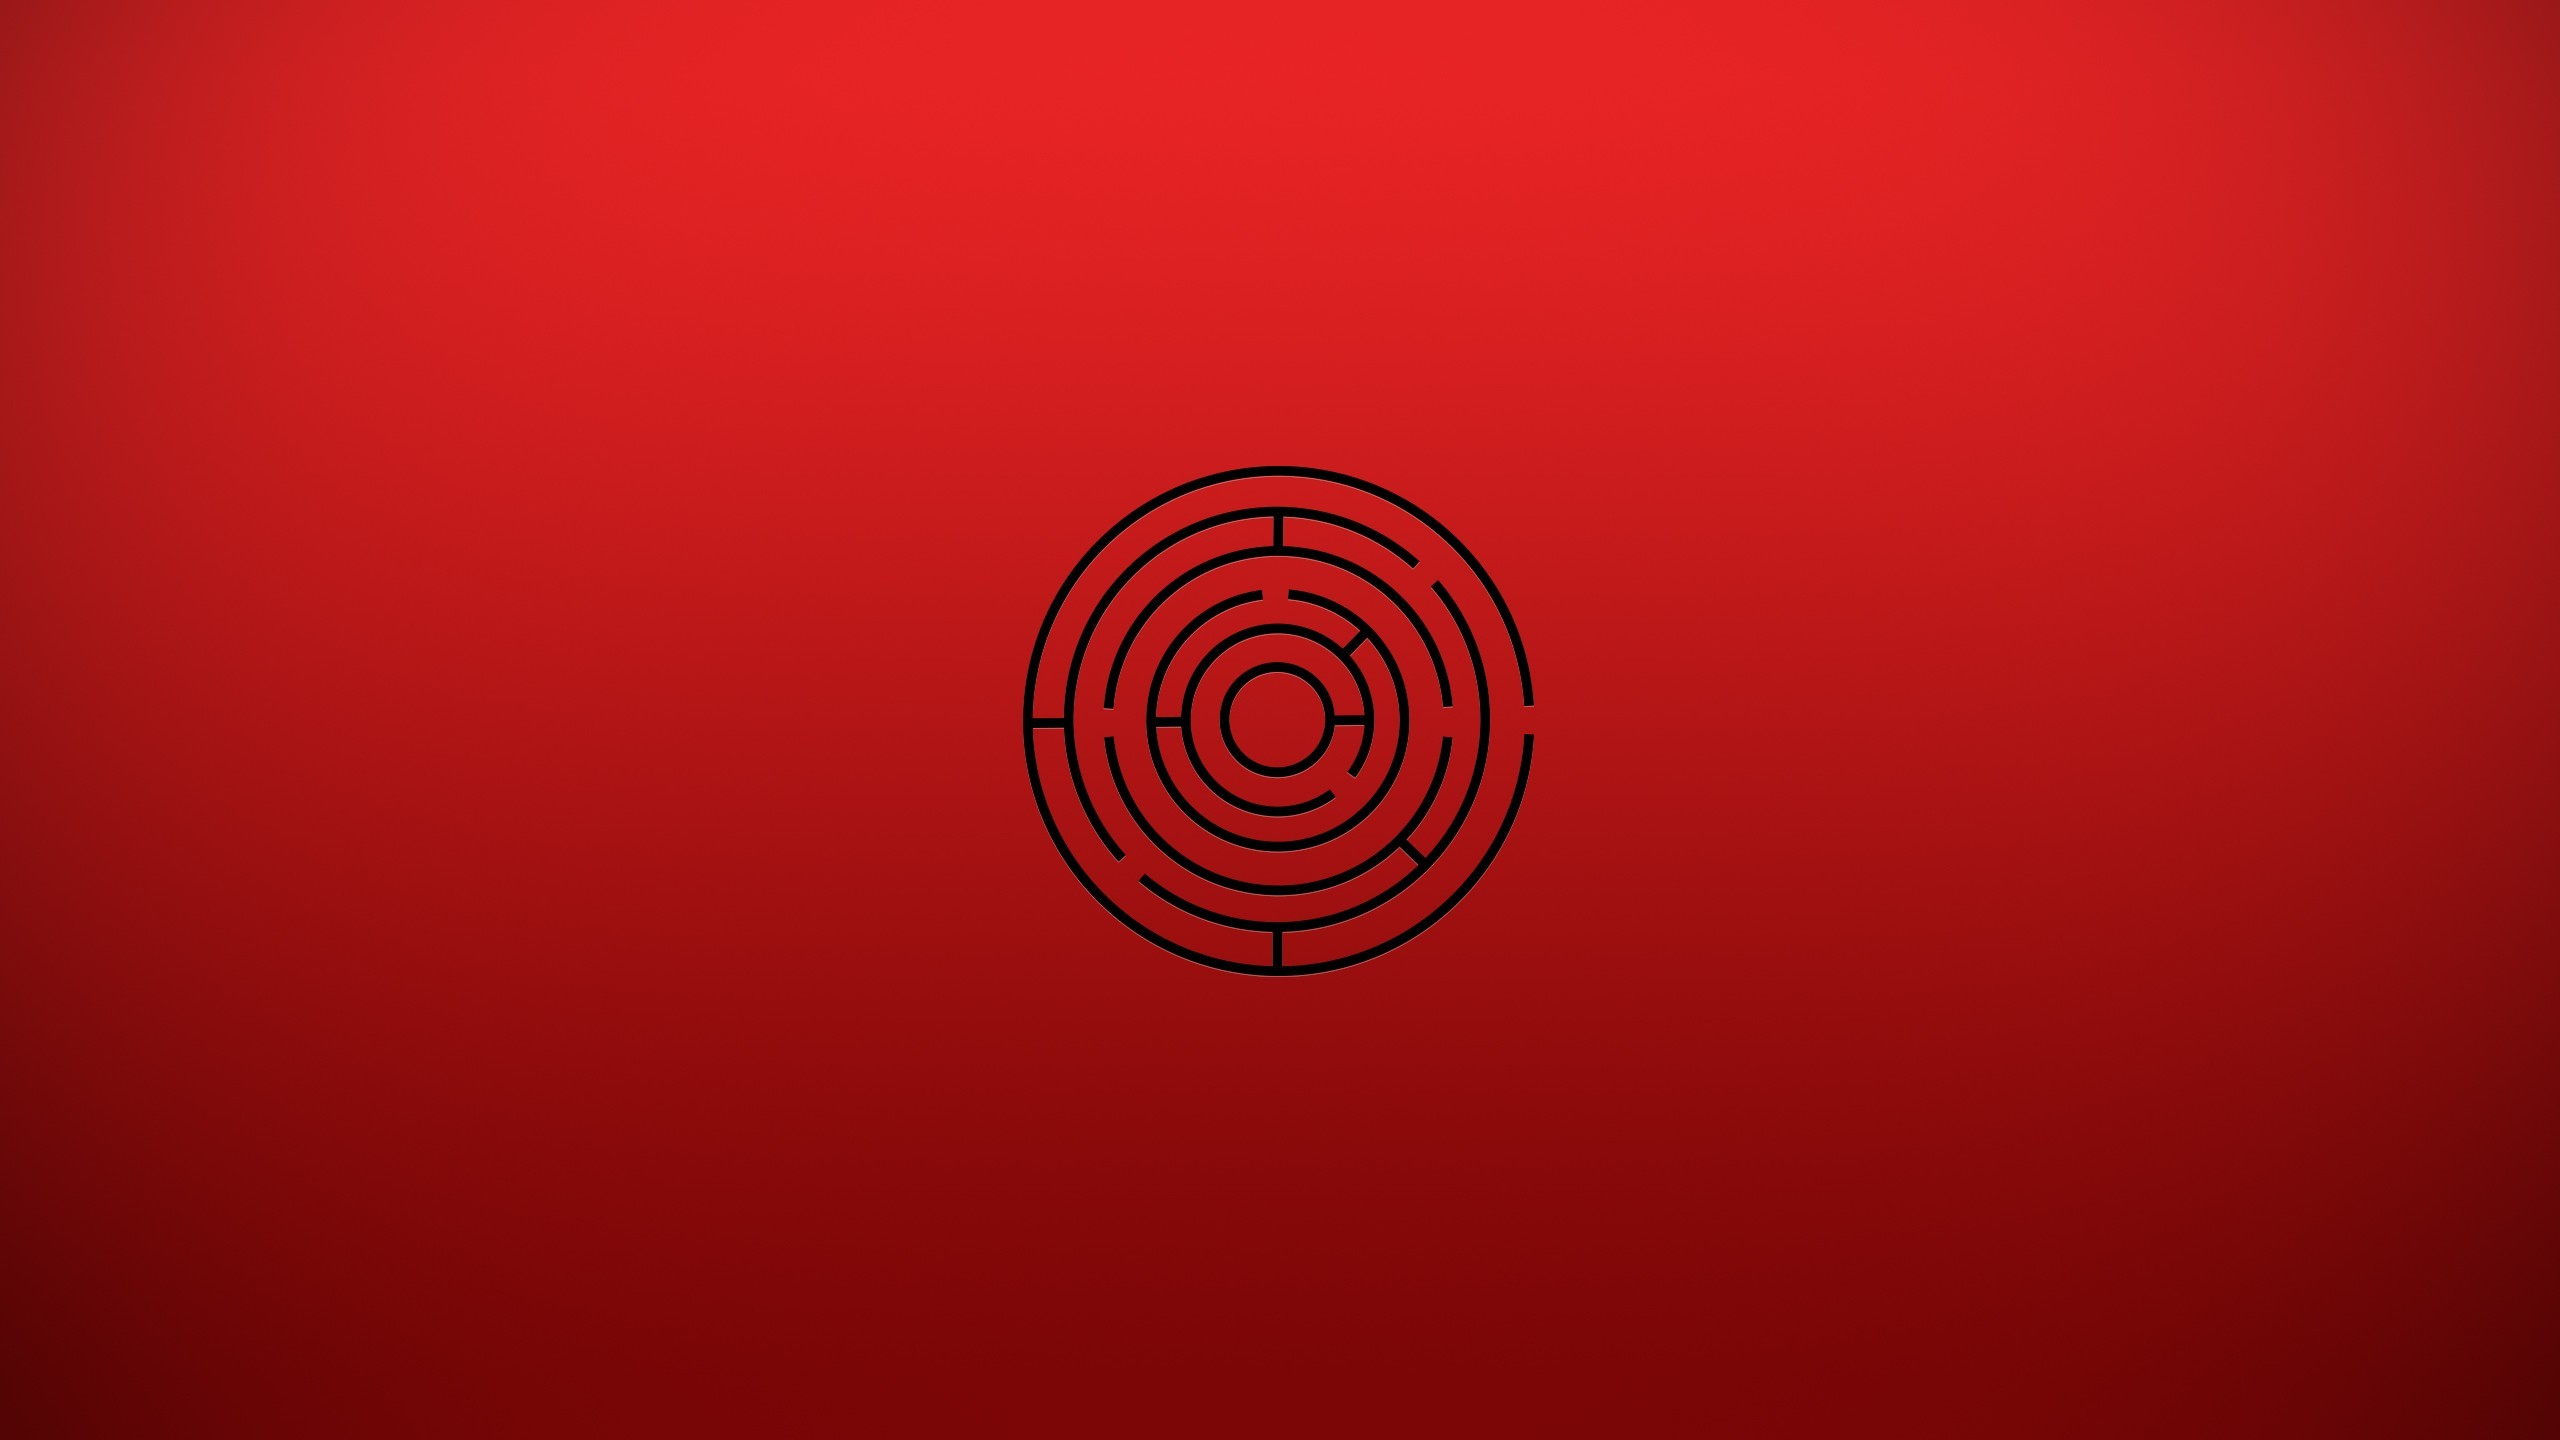 Red Maze Wallpaper Background 61182